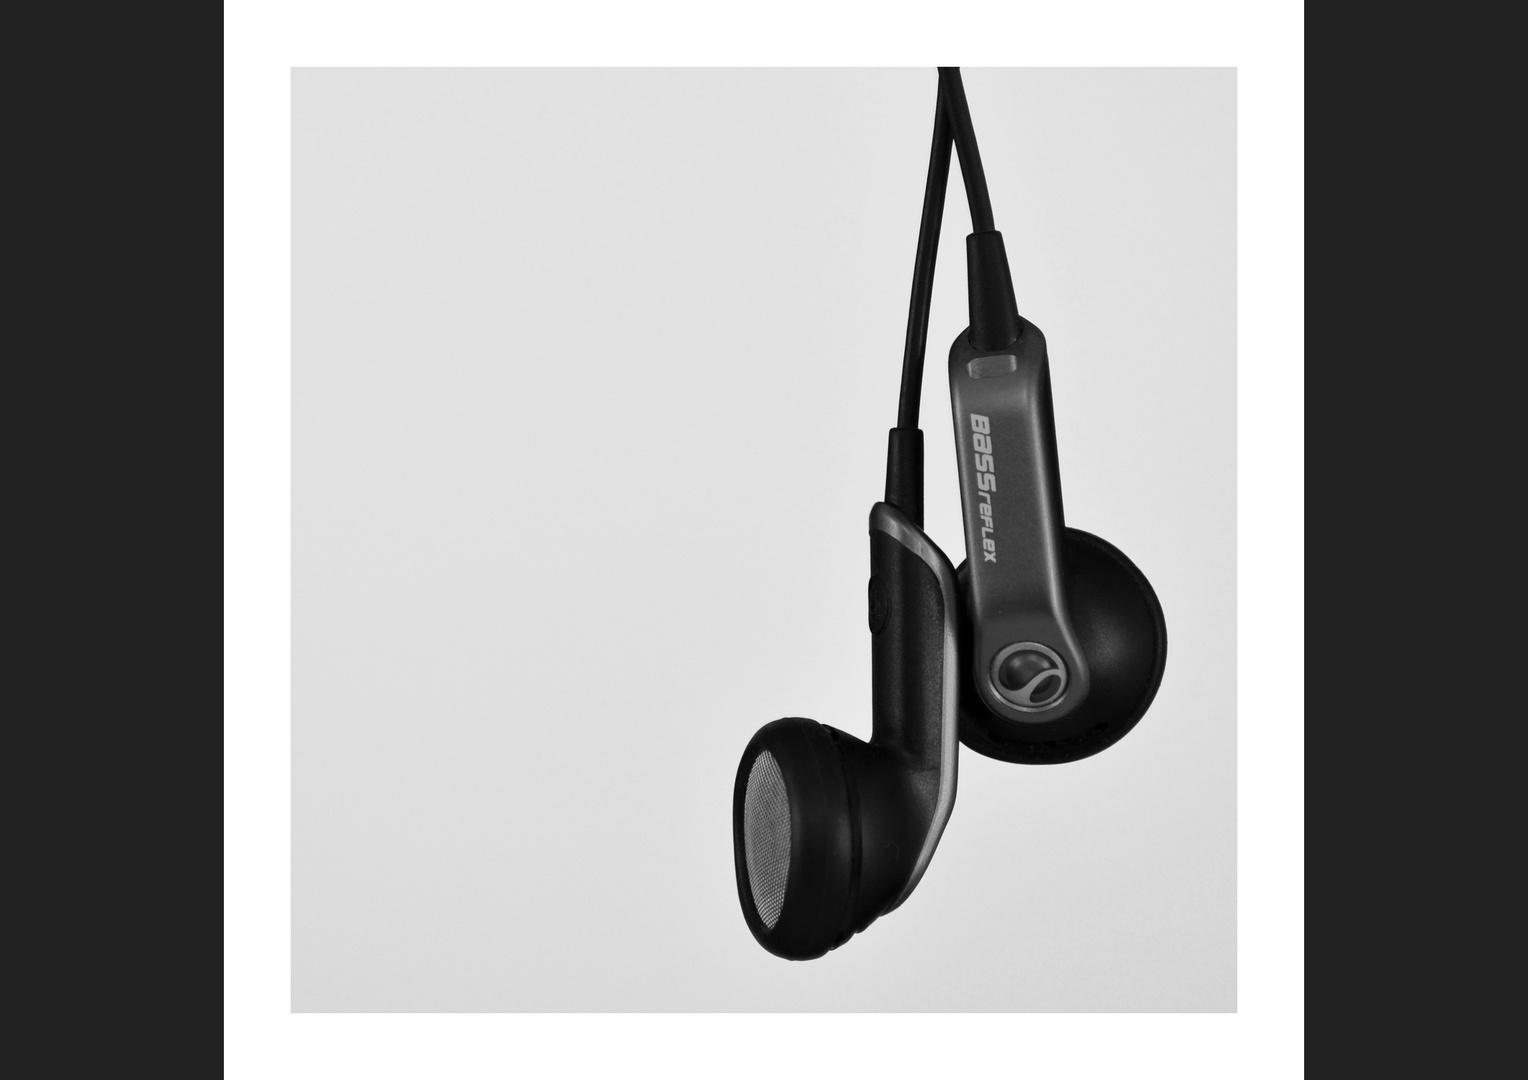 I can hear music*